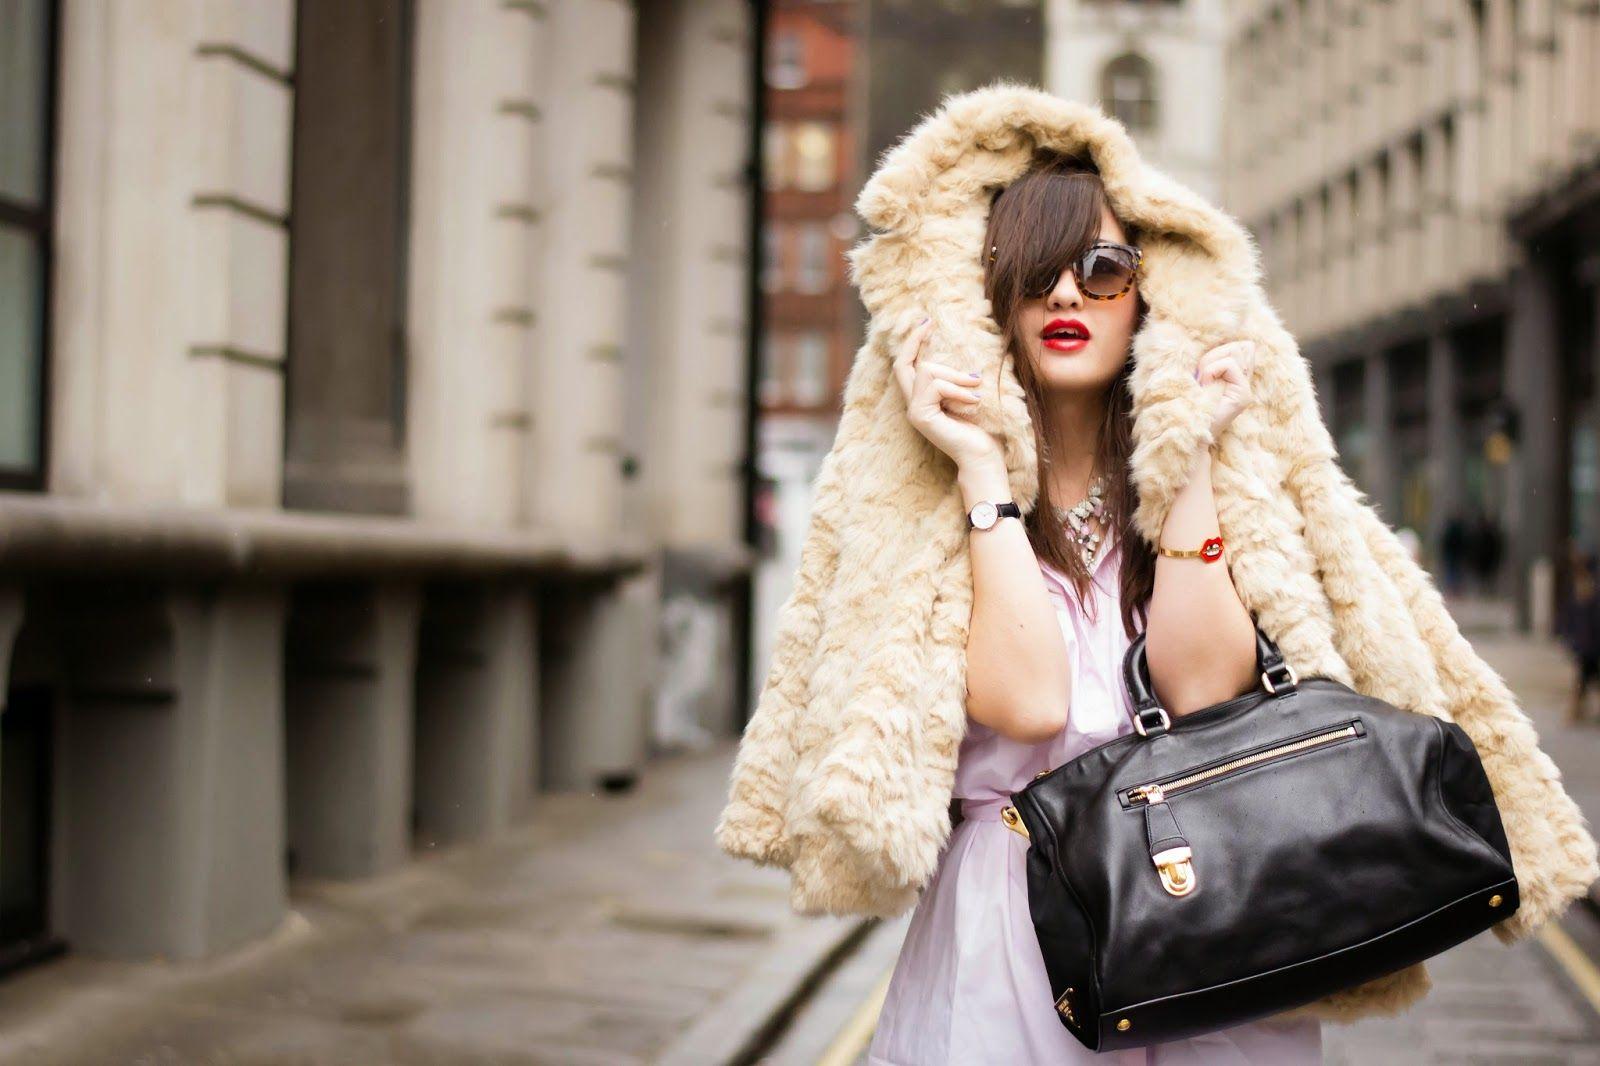 British fashion blogger